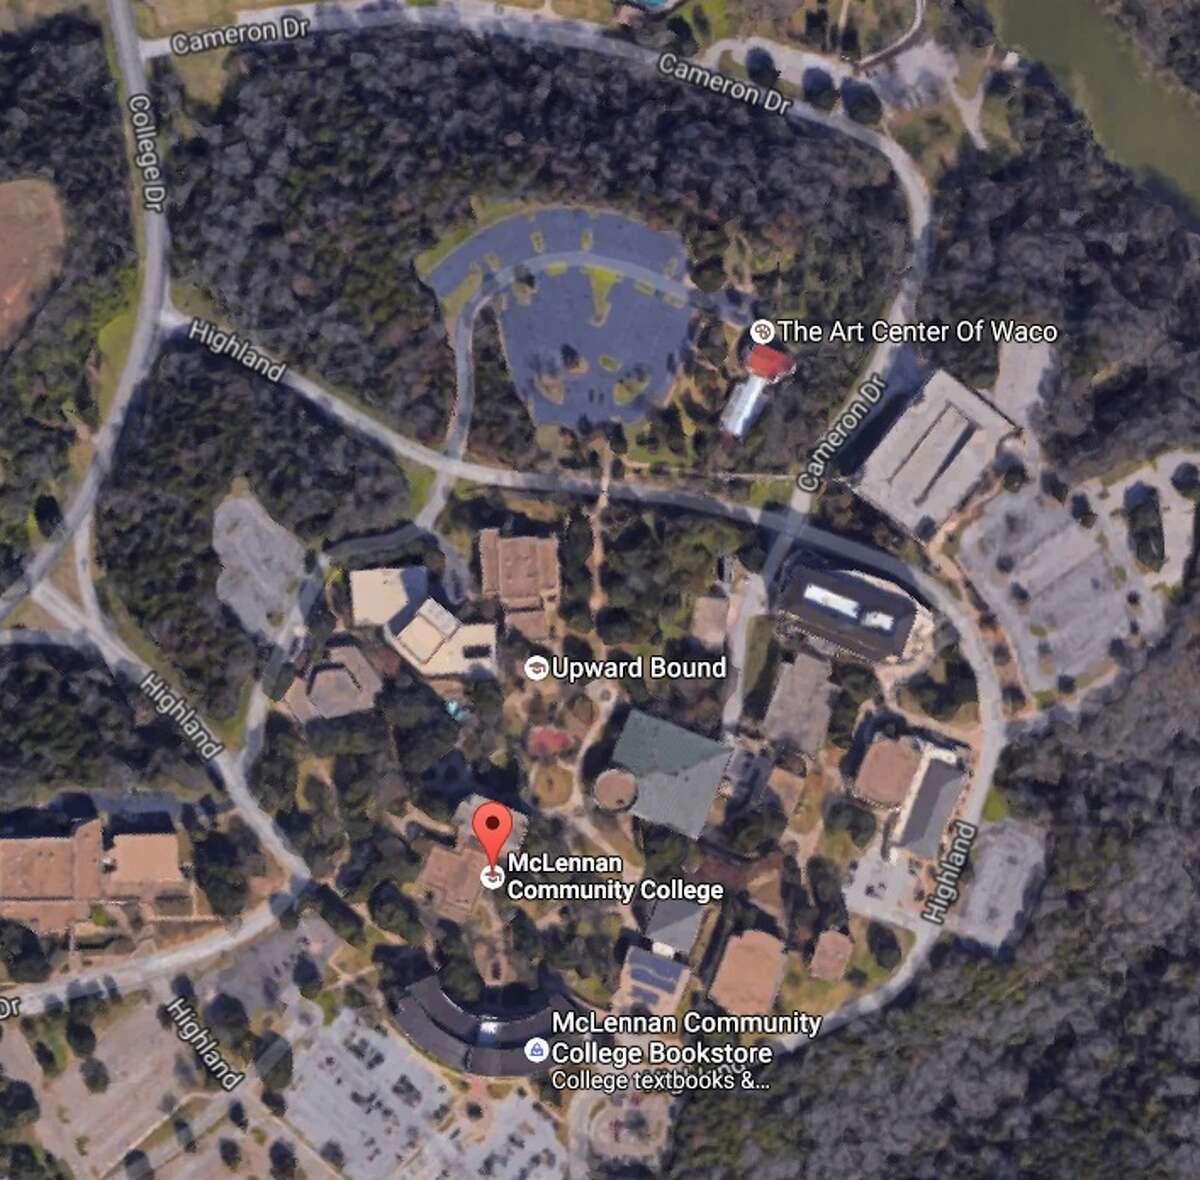 McLennan Community College: Waco Crime incidents per 100,000 students: 144 Property crime incidents: 12 Violent crime incidents: 0 Source:FBI